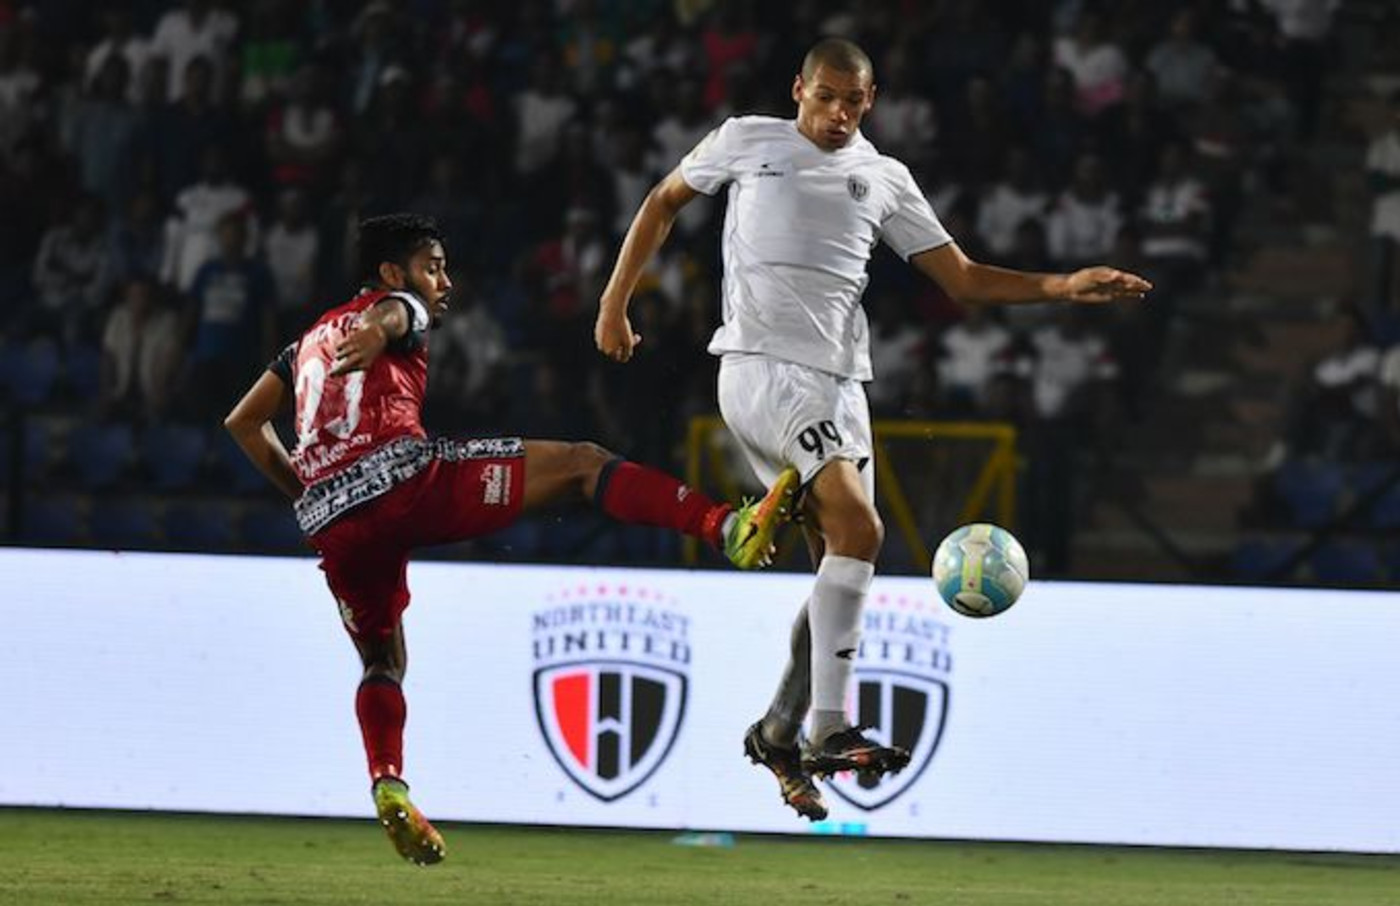 Indian Super League soccer team Jamshedpur goes against Northeast United FC